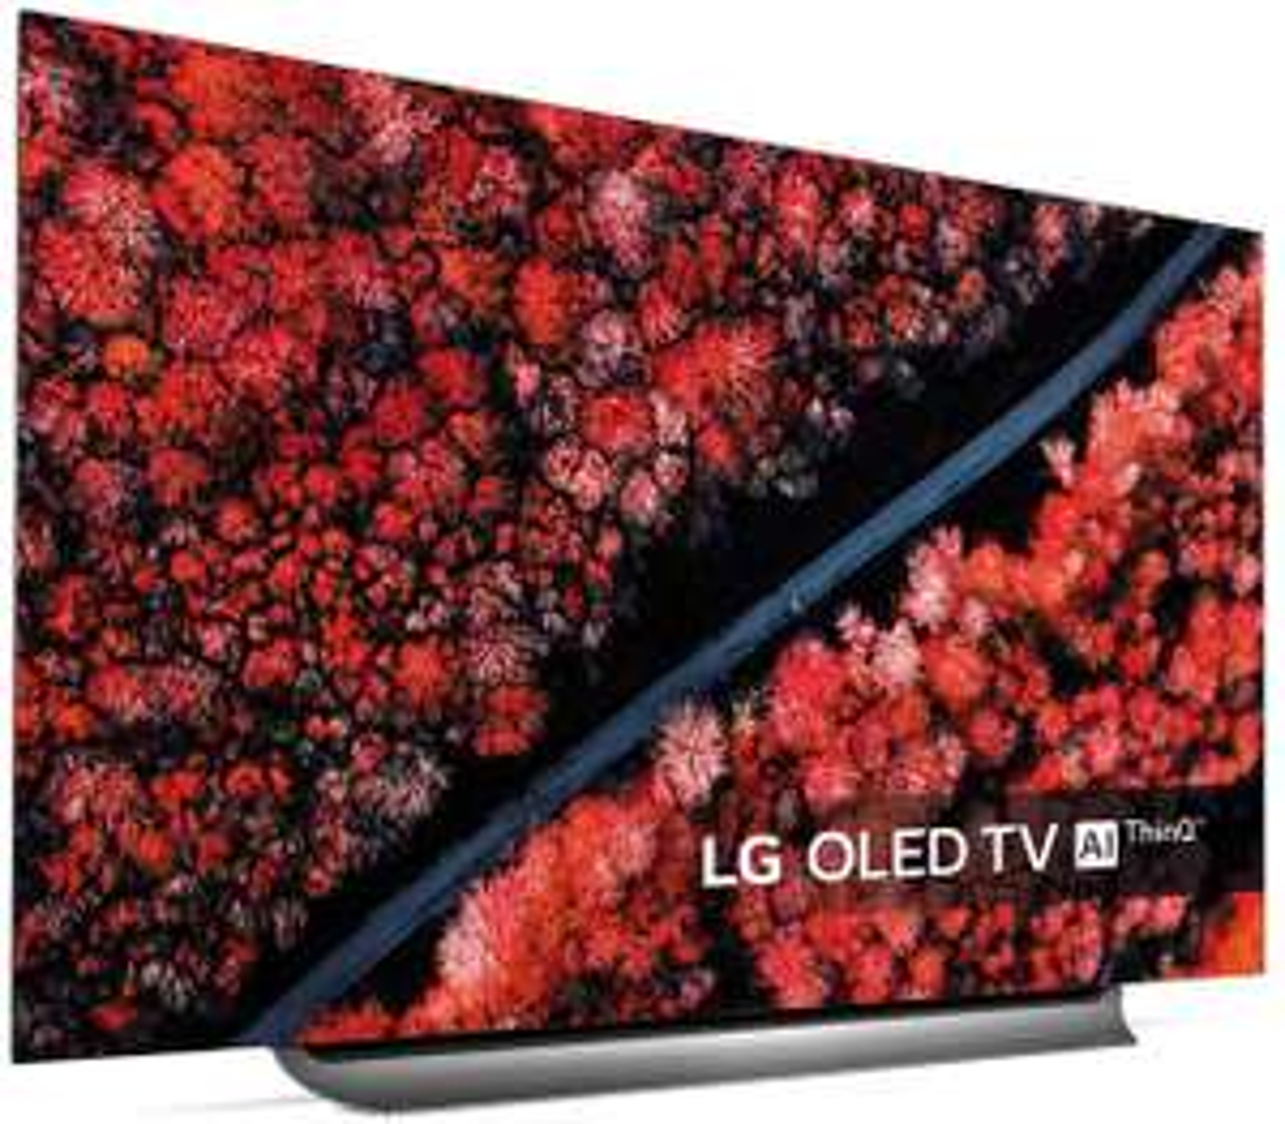 LG Oled 65C9PLA 4K UHD TV £1,439.96 at Haydock Costco